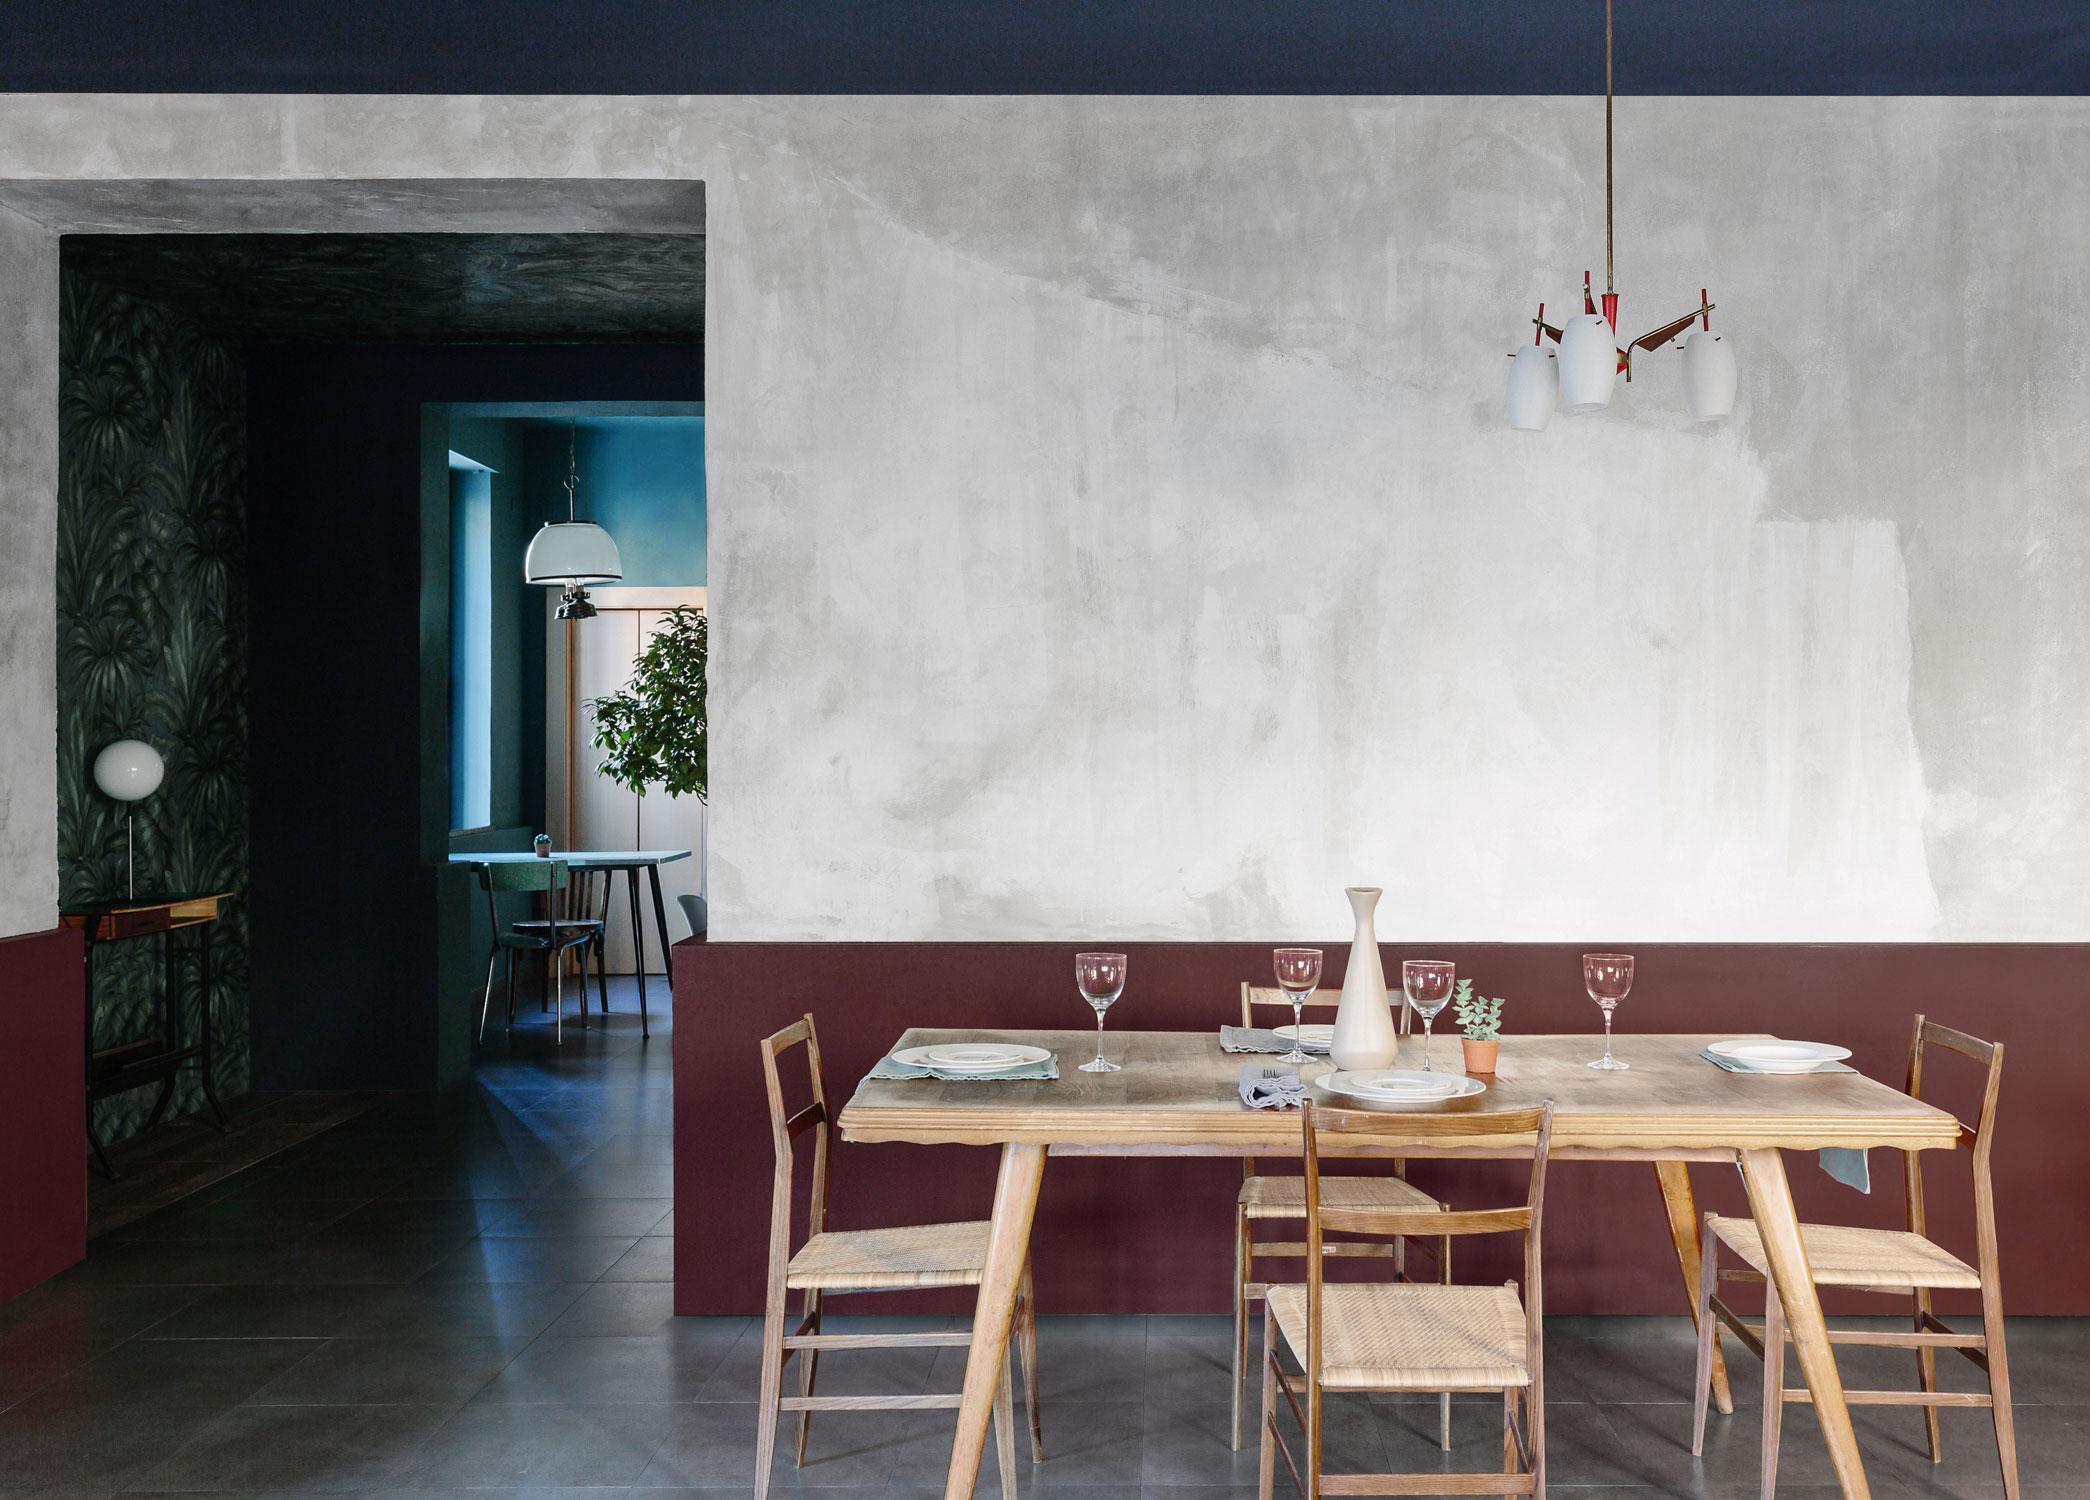 Cool milano italy with interior designer milano for Interior designer milano